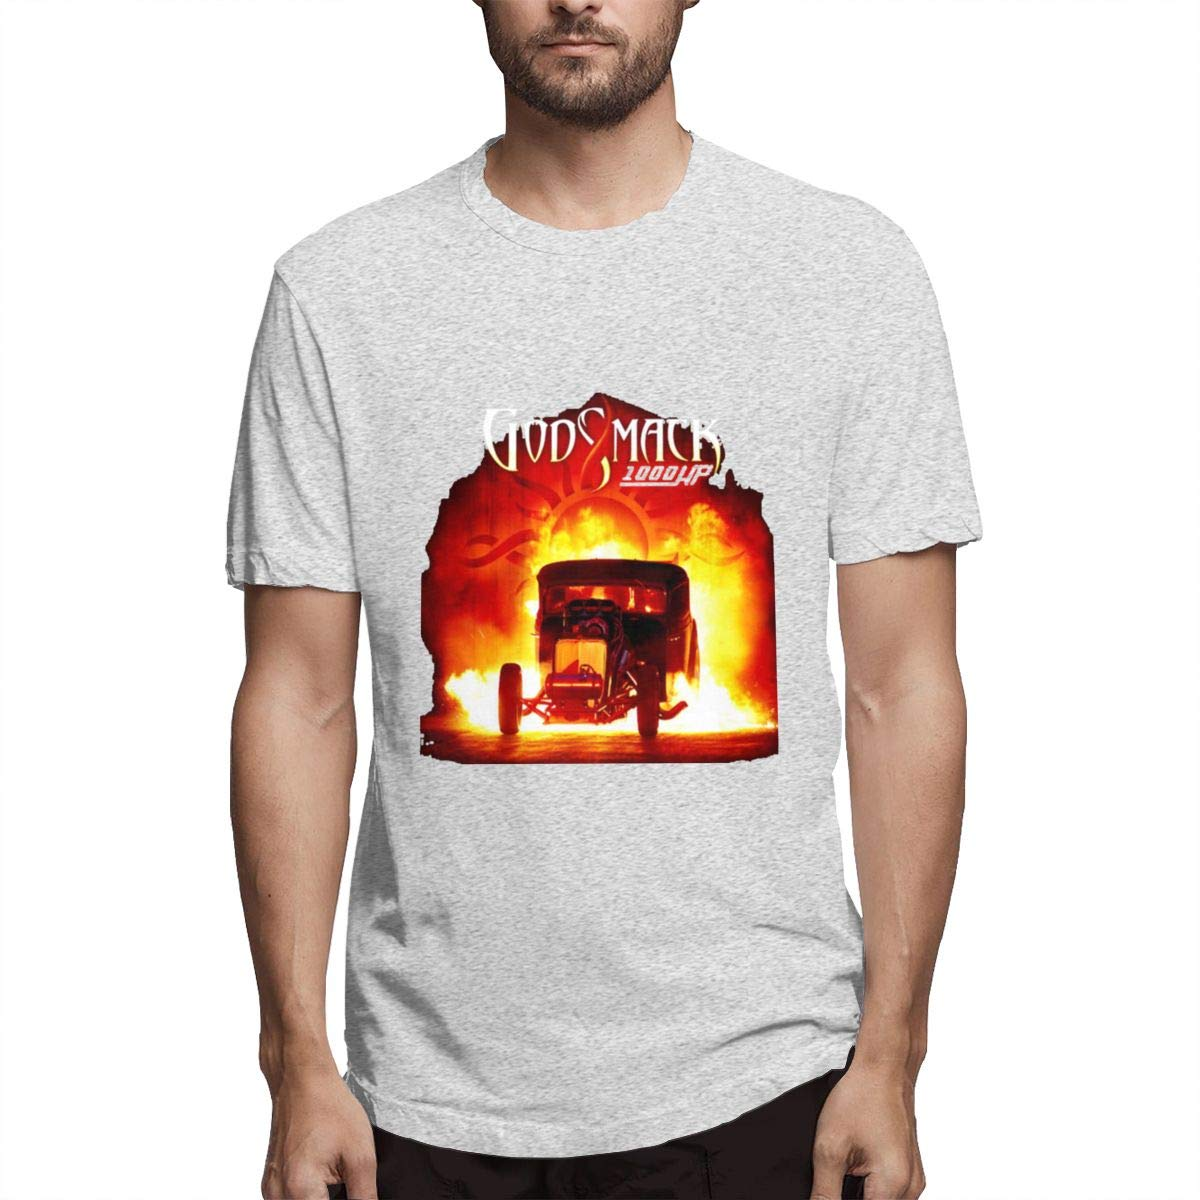 Luxendary Men Logo Funny Godsmack 1000hp Classic Athletic Round Neck Short Sleeve Shirt